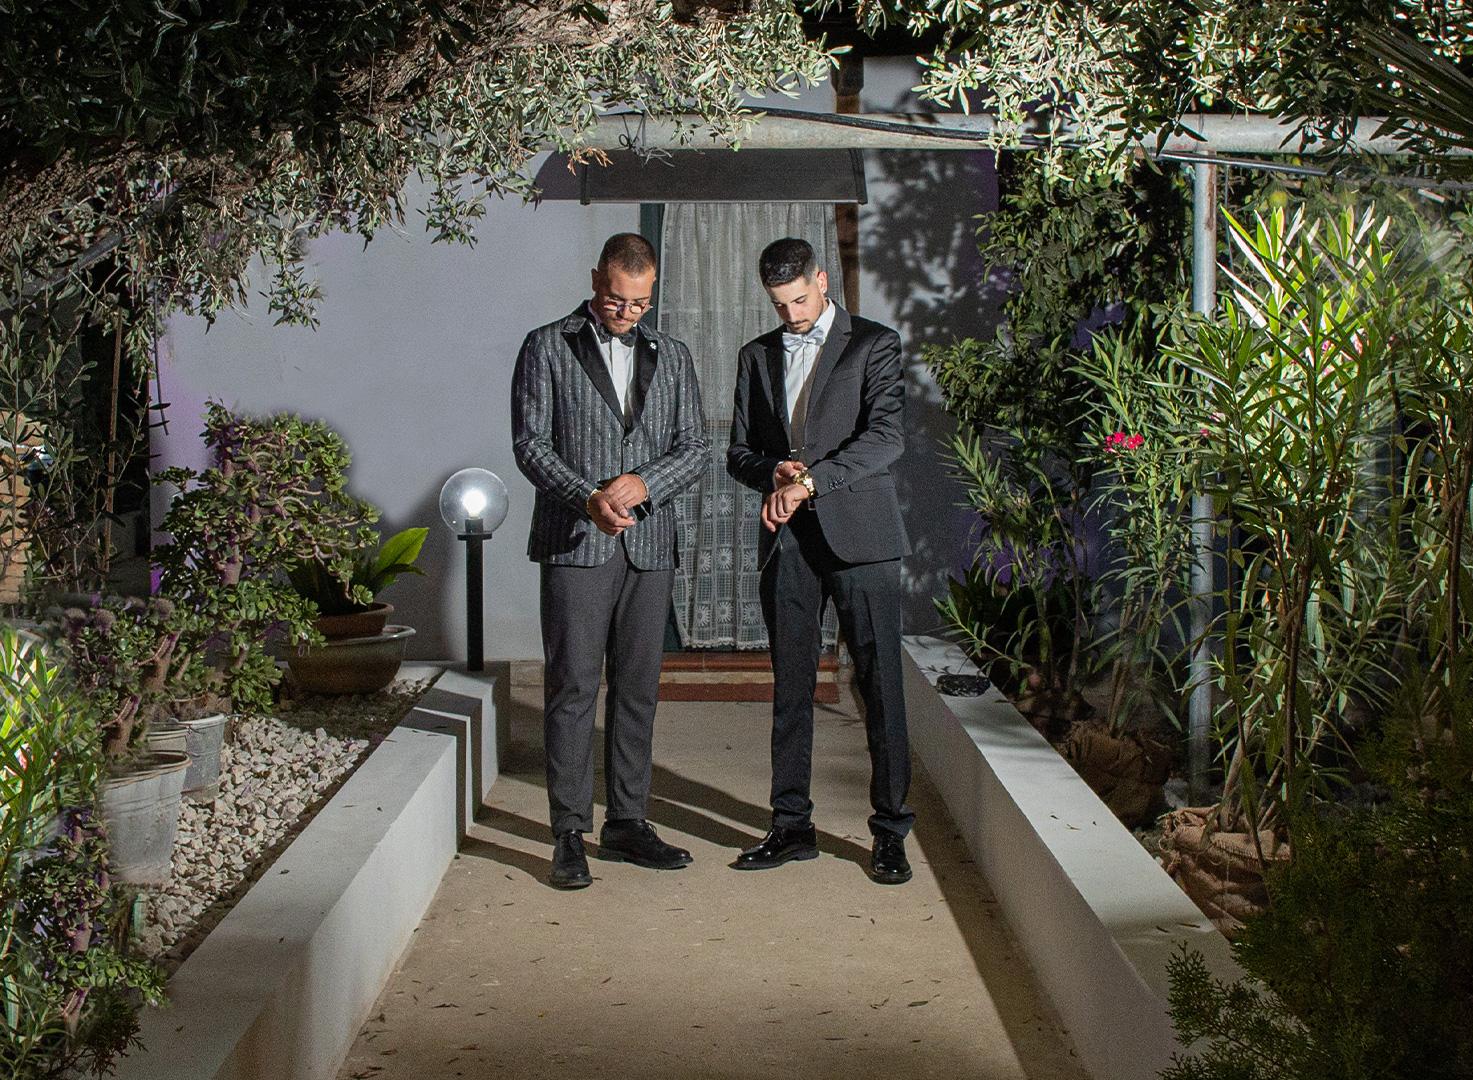 Monica Sutera fotografo - fotografo matrimonio agrigento - fotografo wedding agrigento